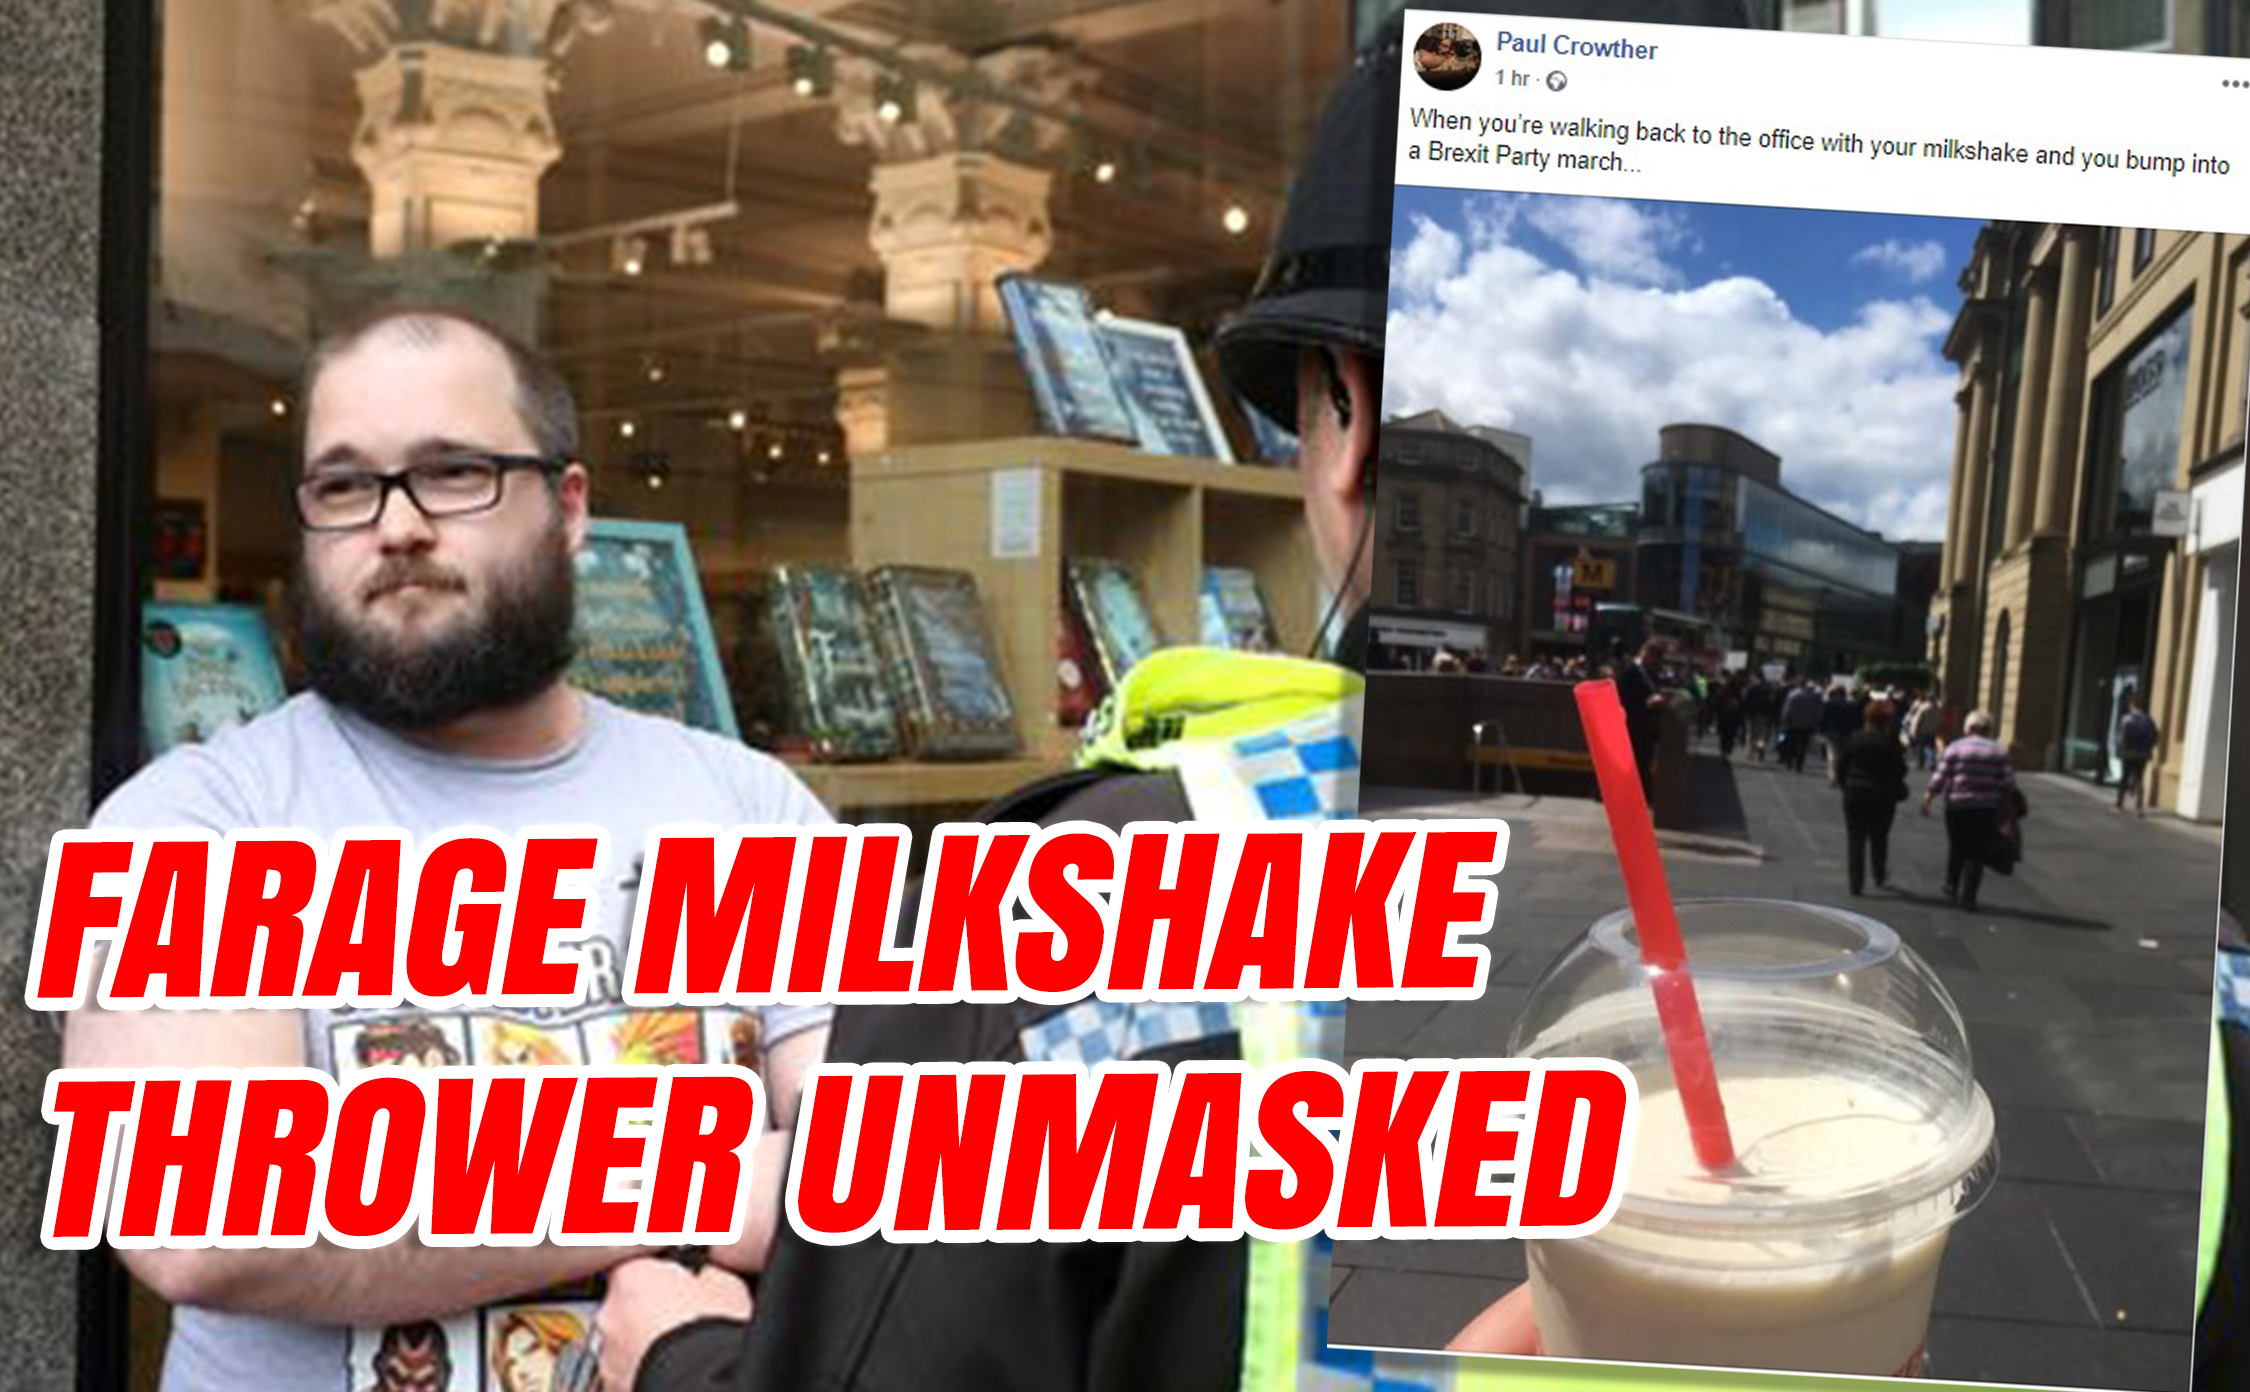 Farage Milkshaker Unmasked